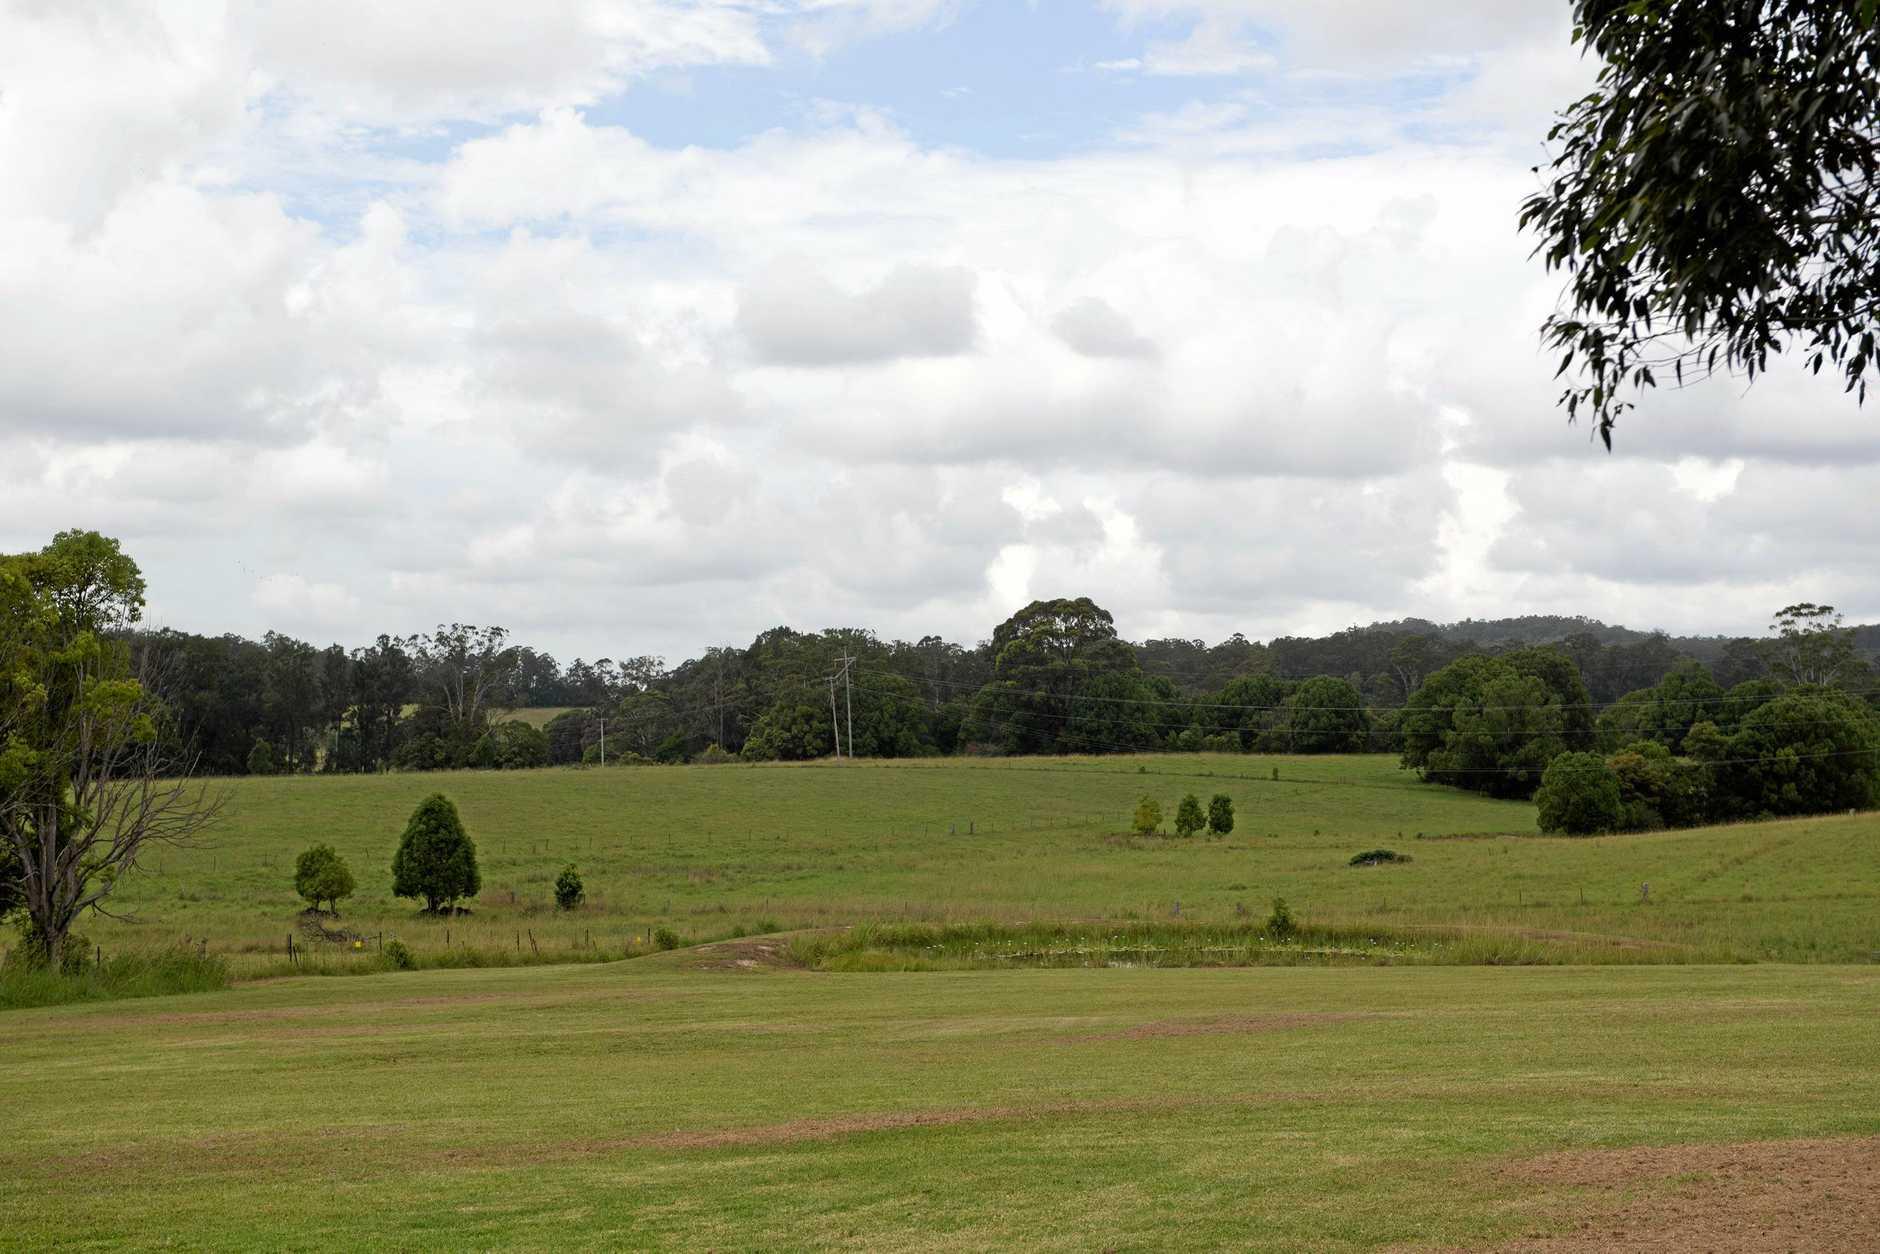 The proposed site of the solar farm off Ferrett's Rd.